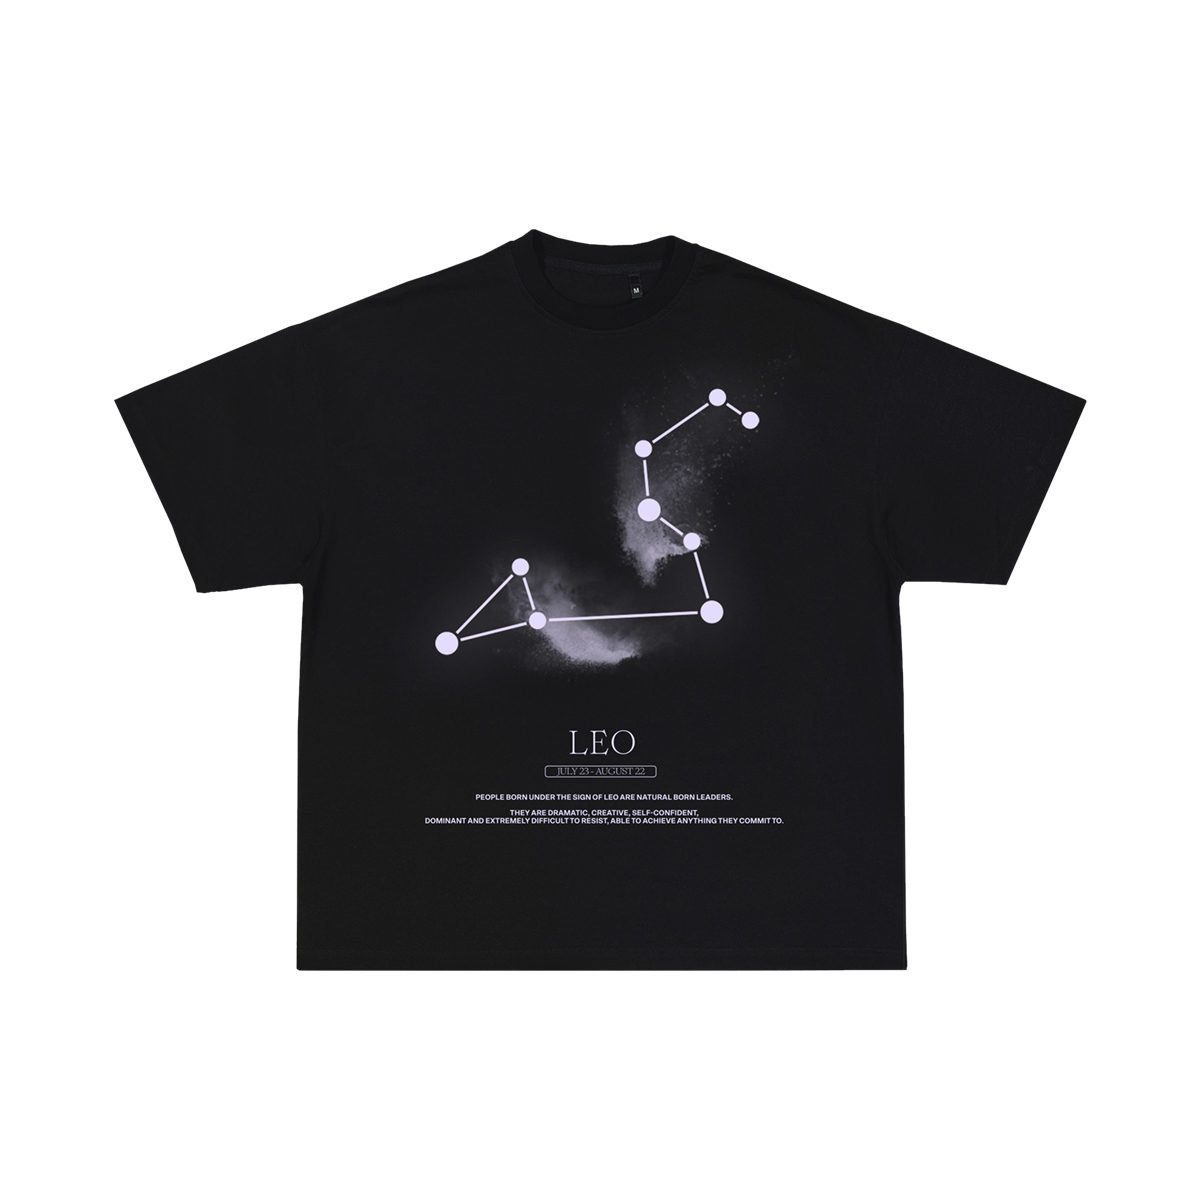 Leo T-Shirt + Wunna Digital Download